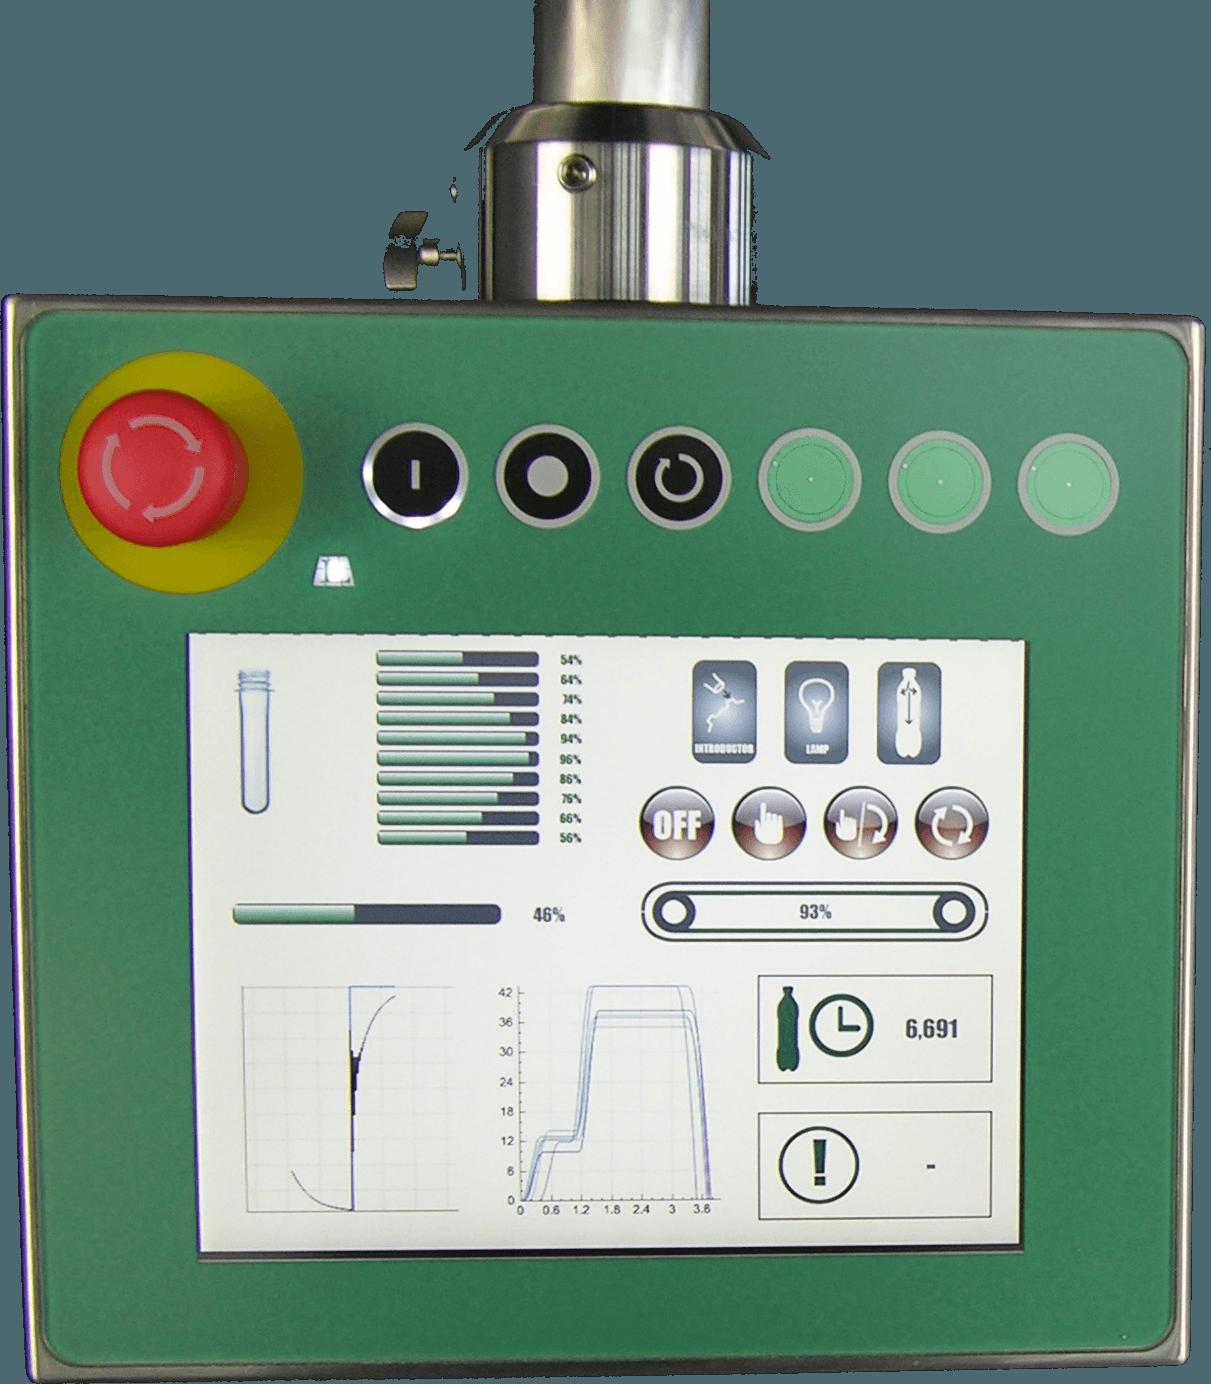 controladores industriales higienizables HIPC